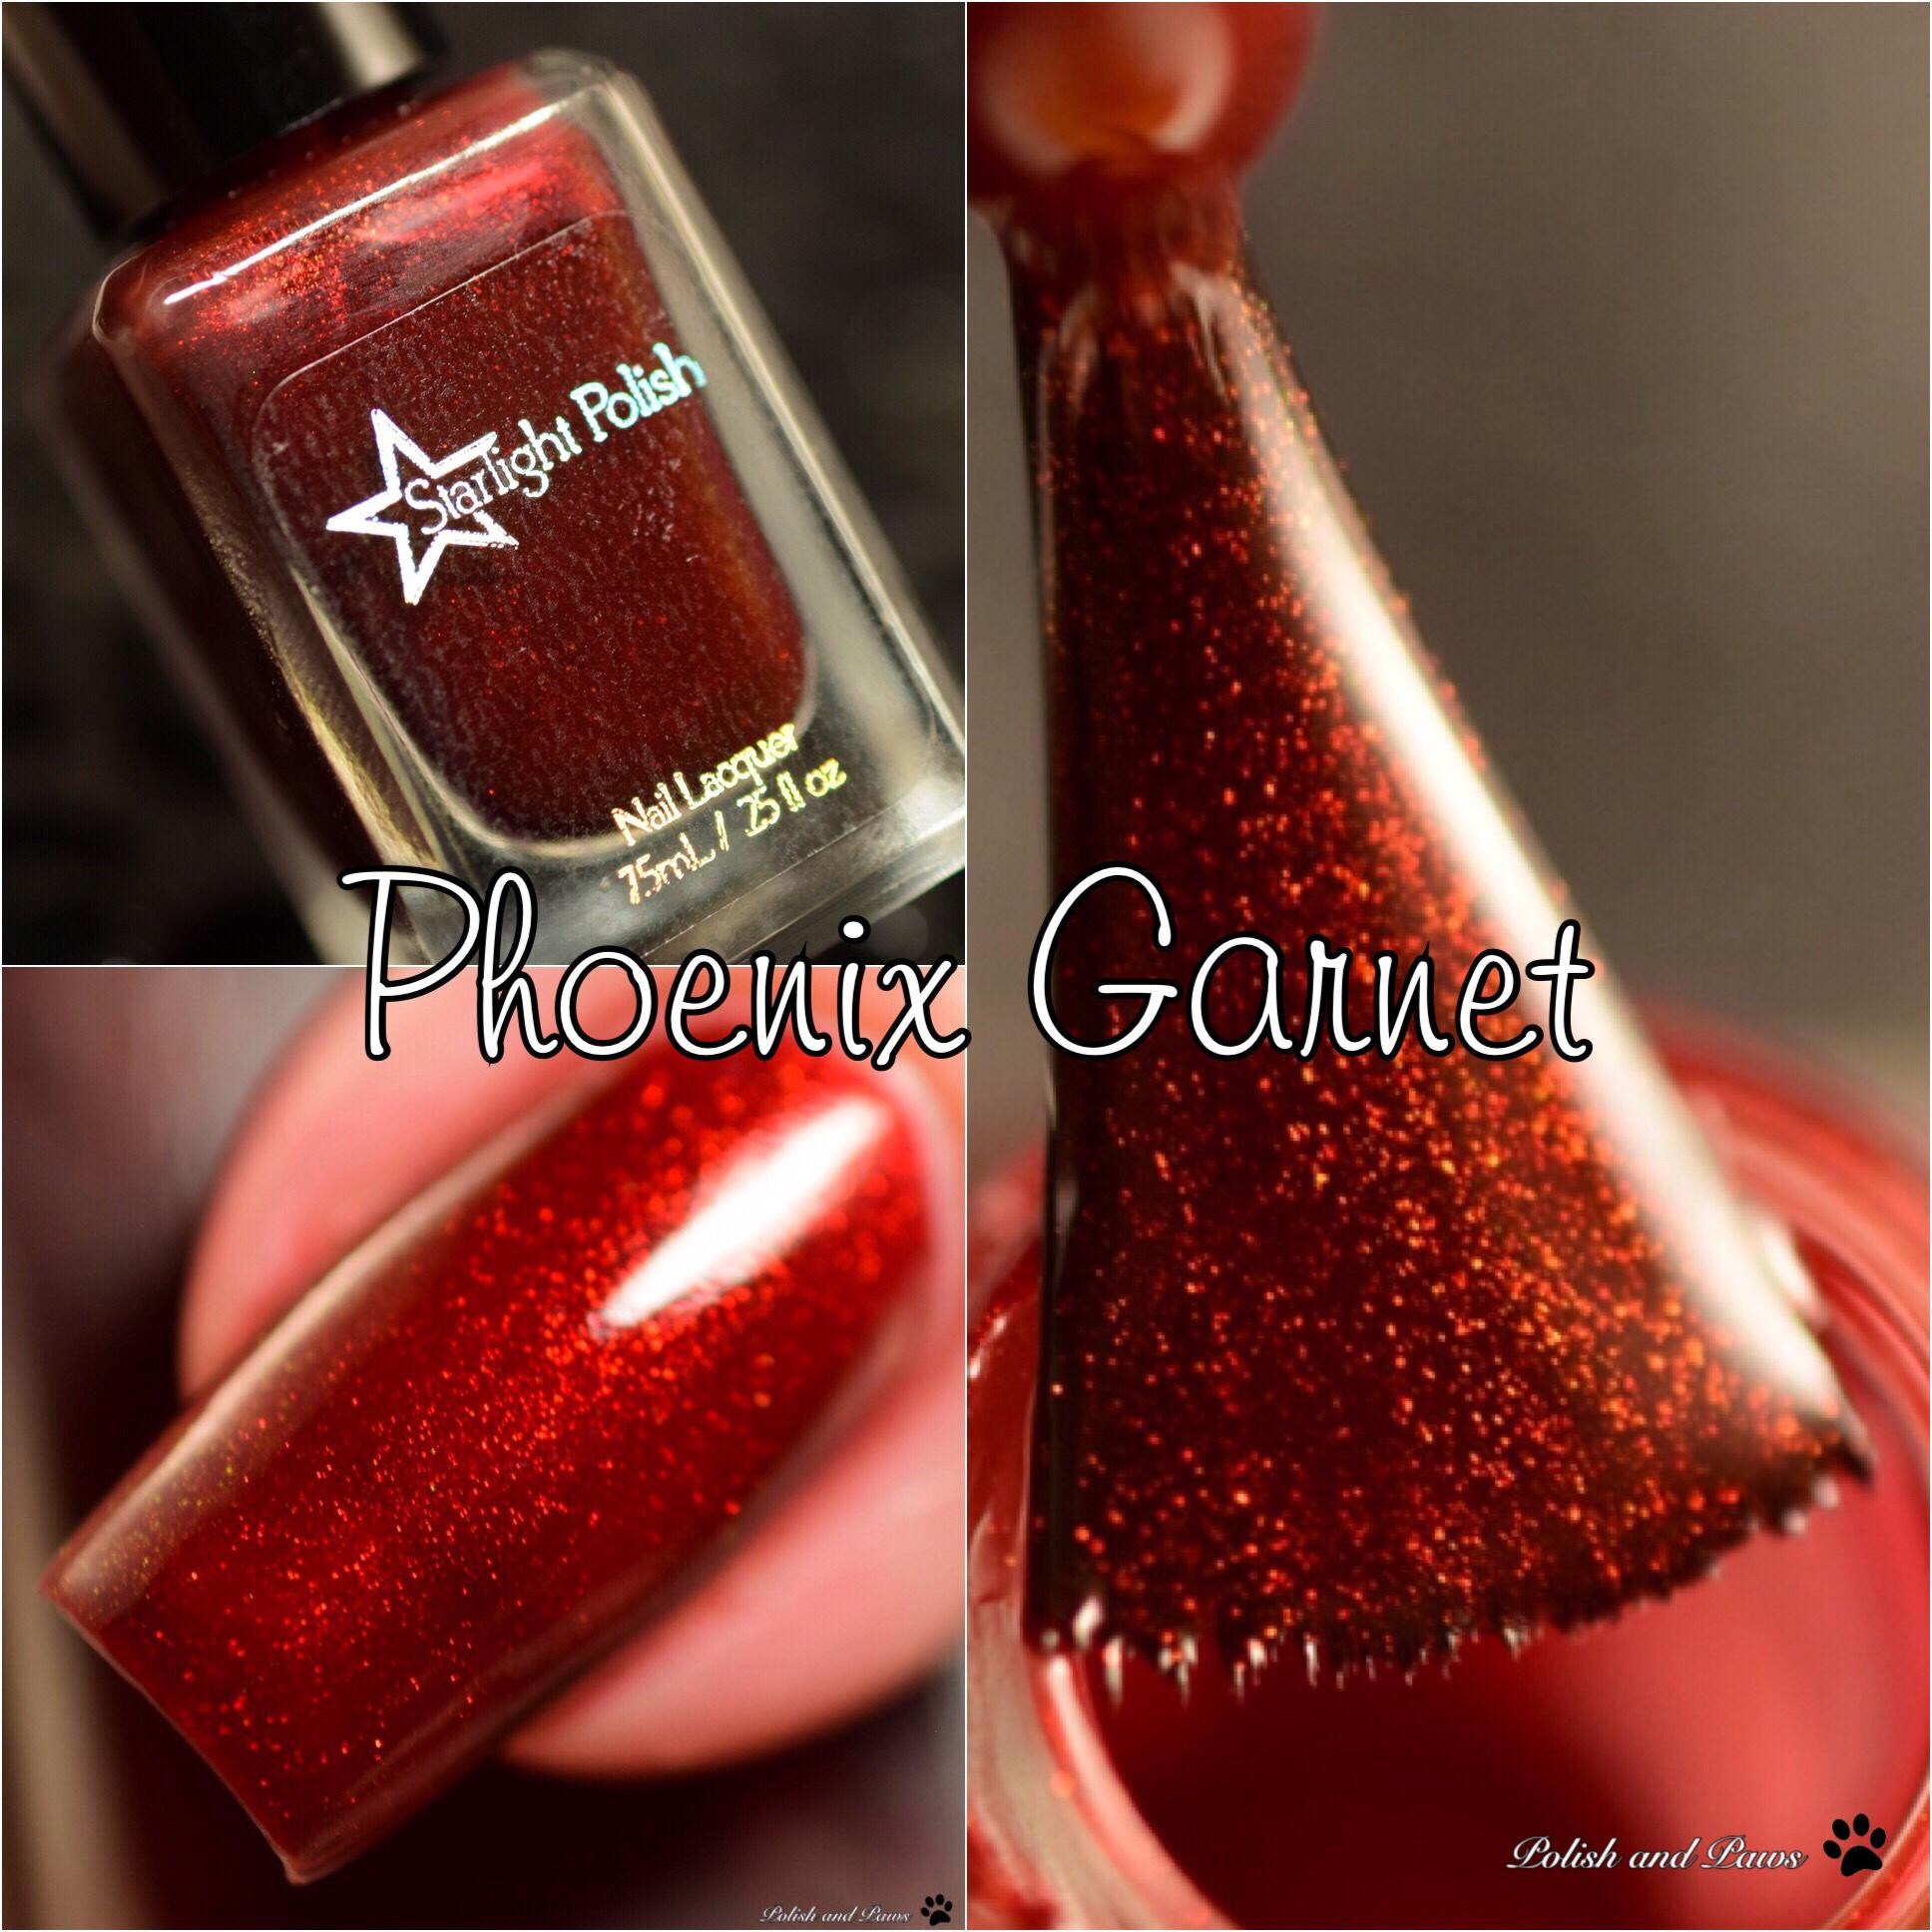 Starlight Polish Phoenix Garnet